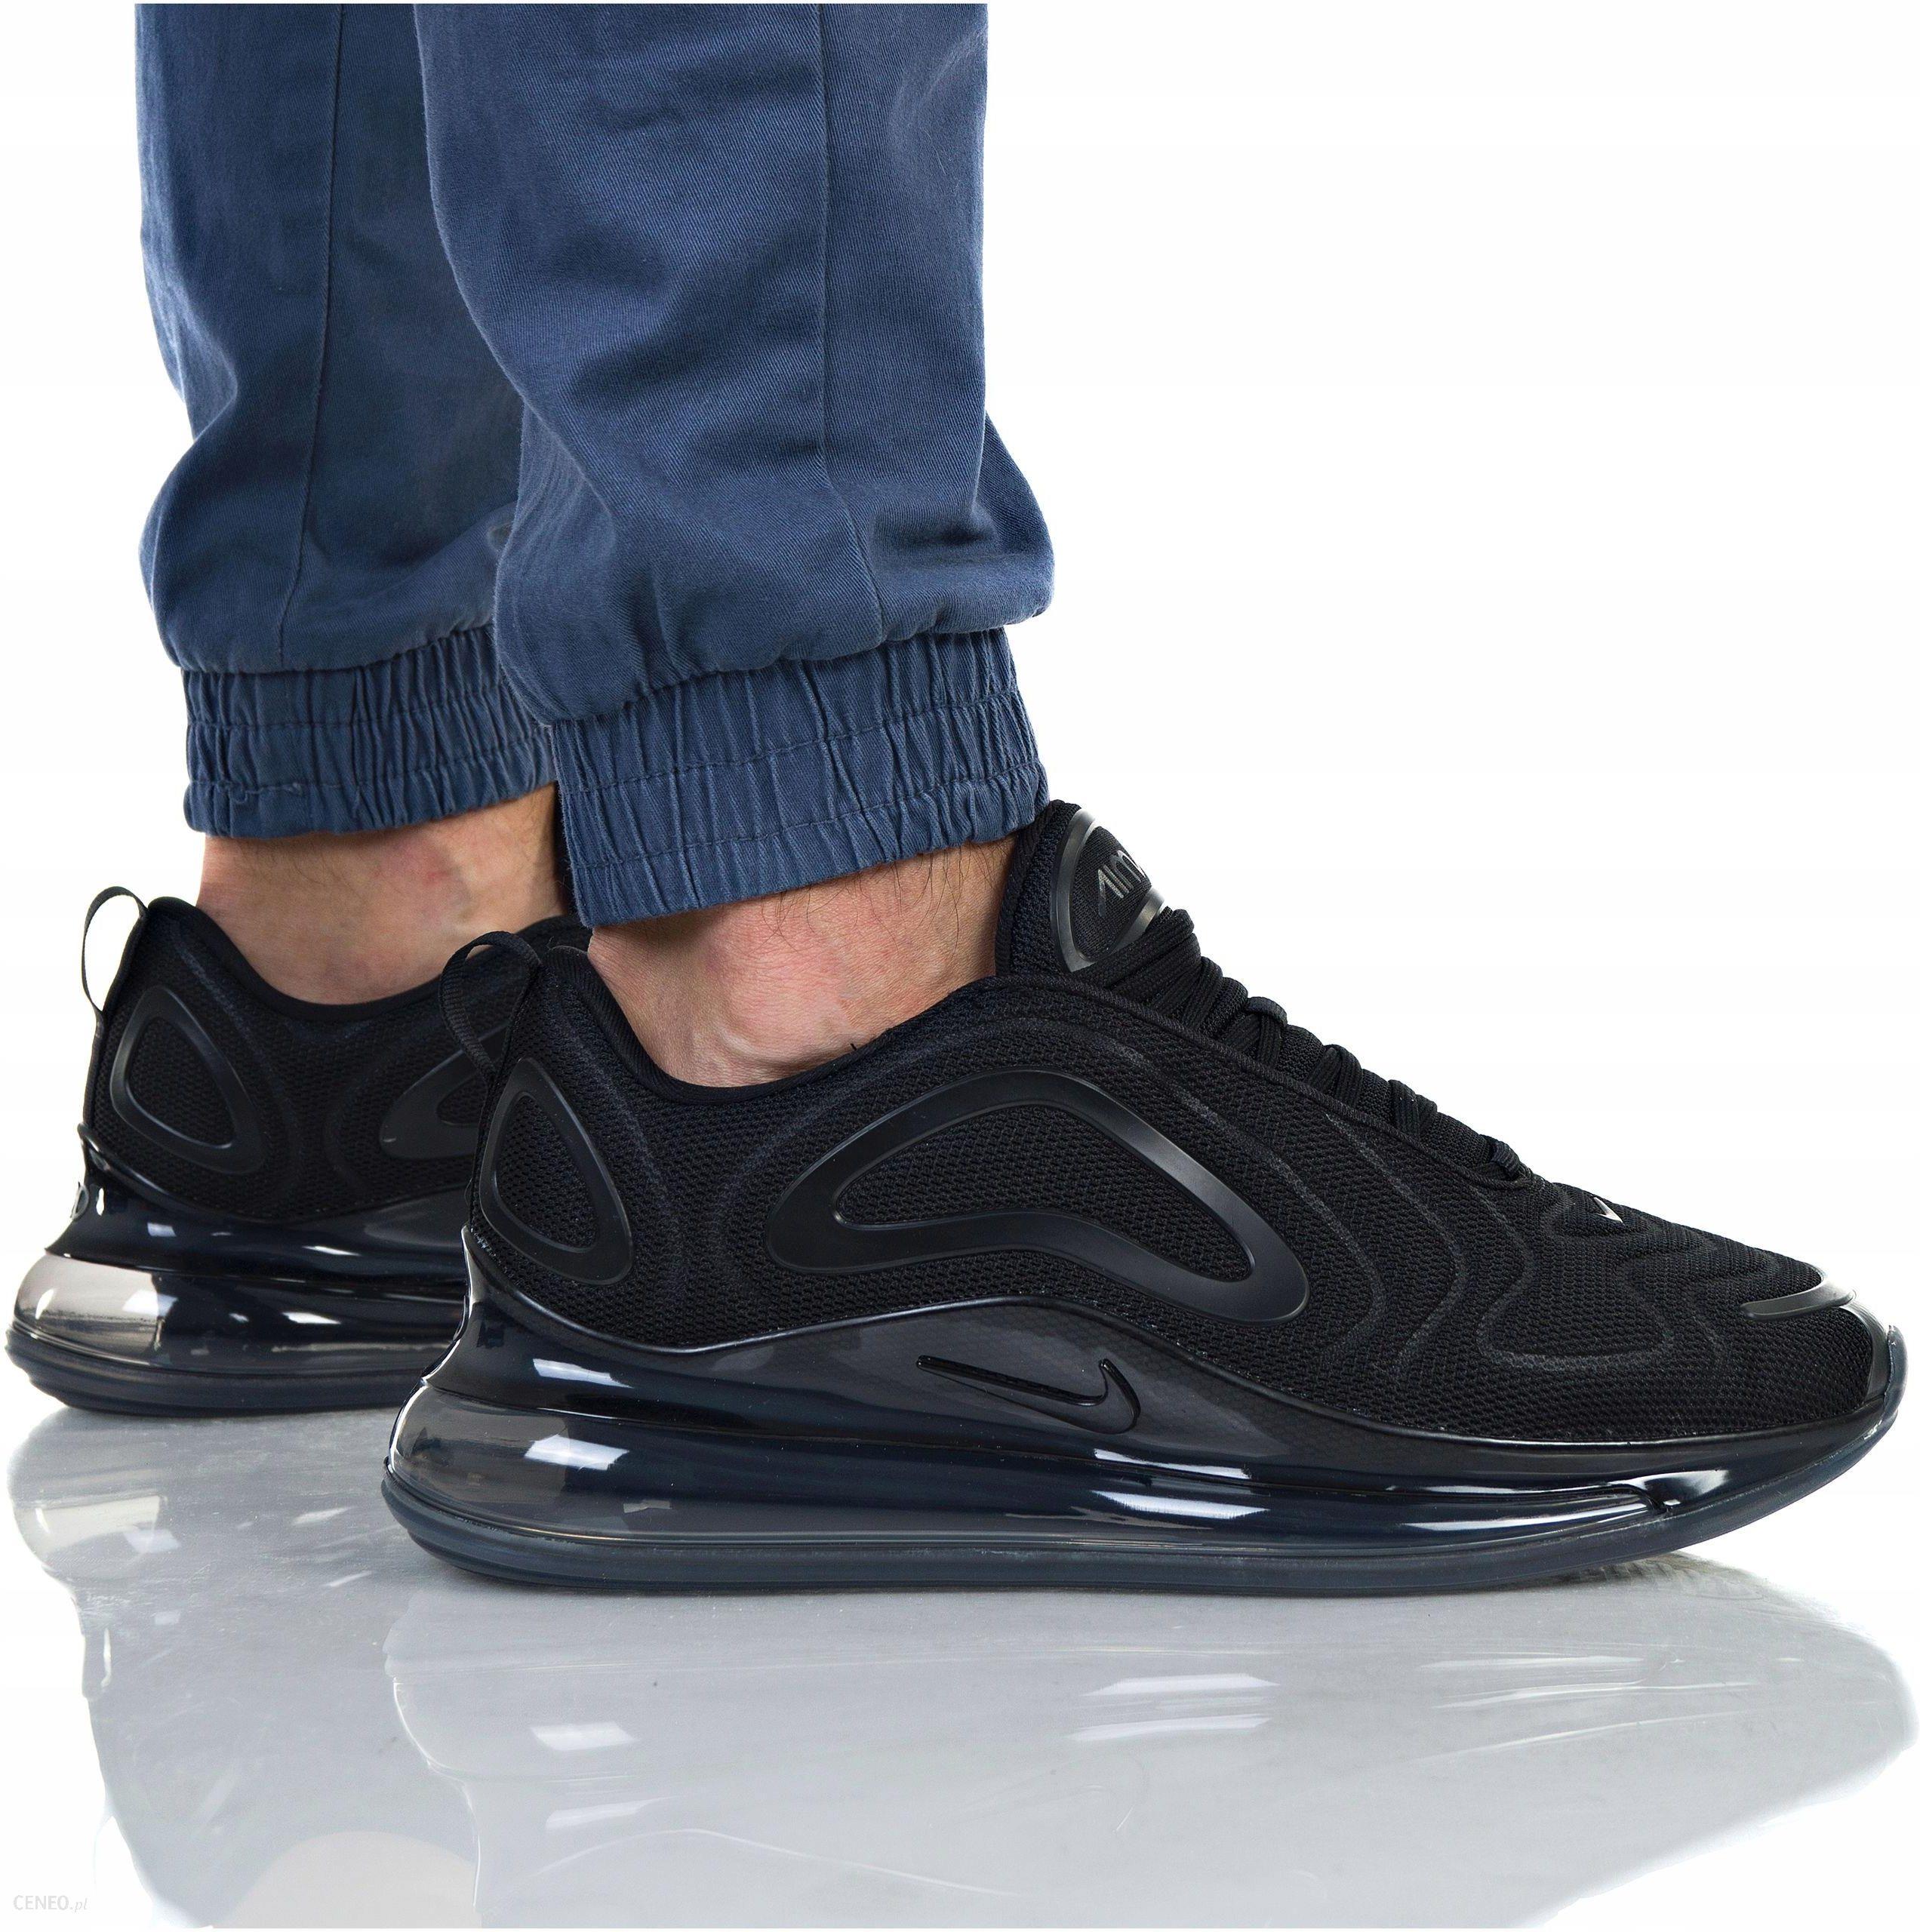 buty nike air max kpu dark blue na nogach